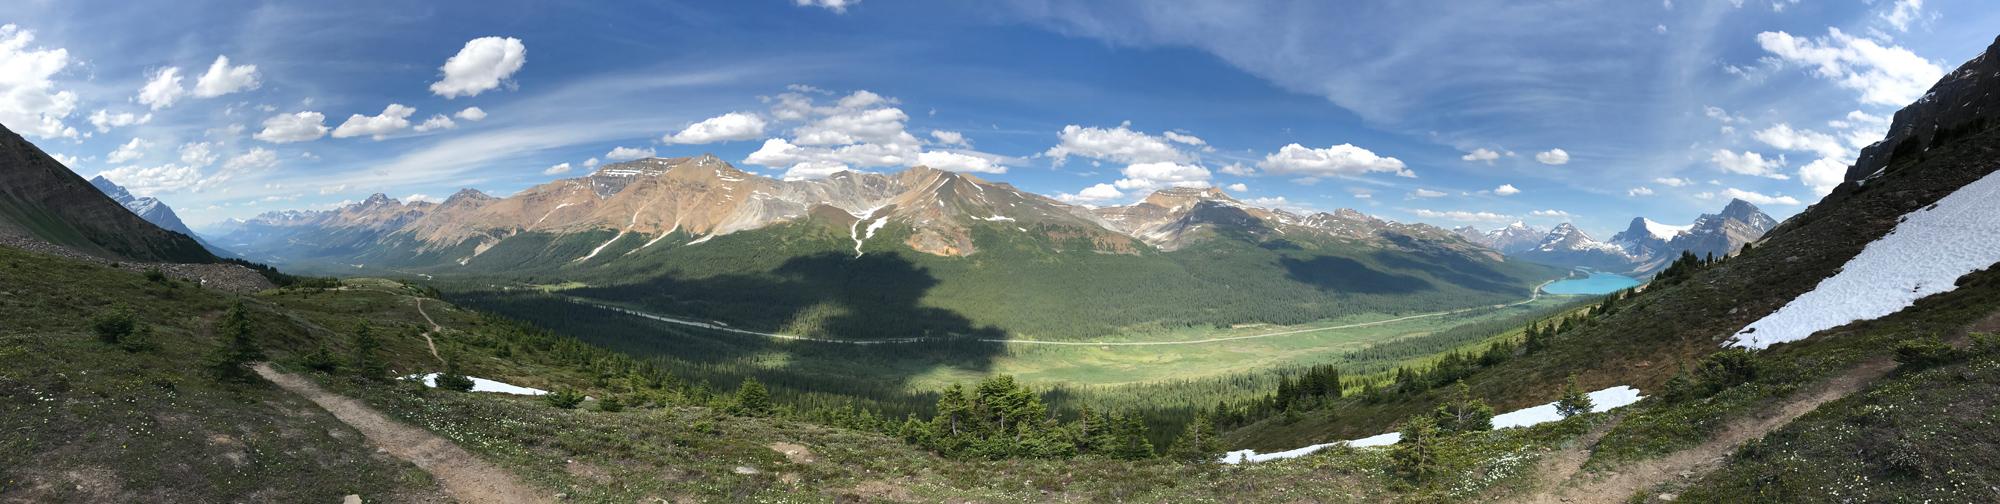 bow-summit-panorama.jpg